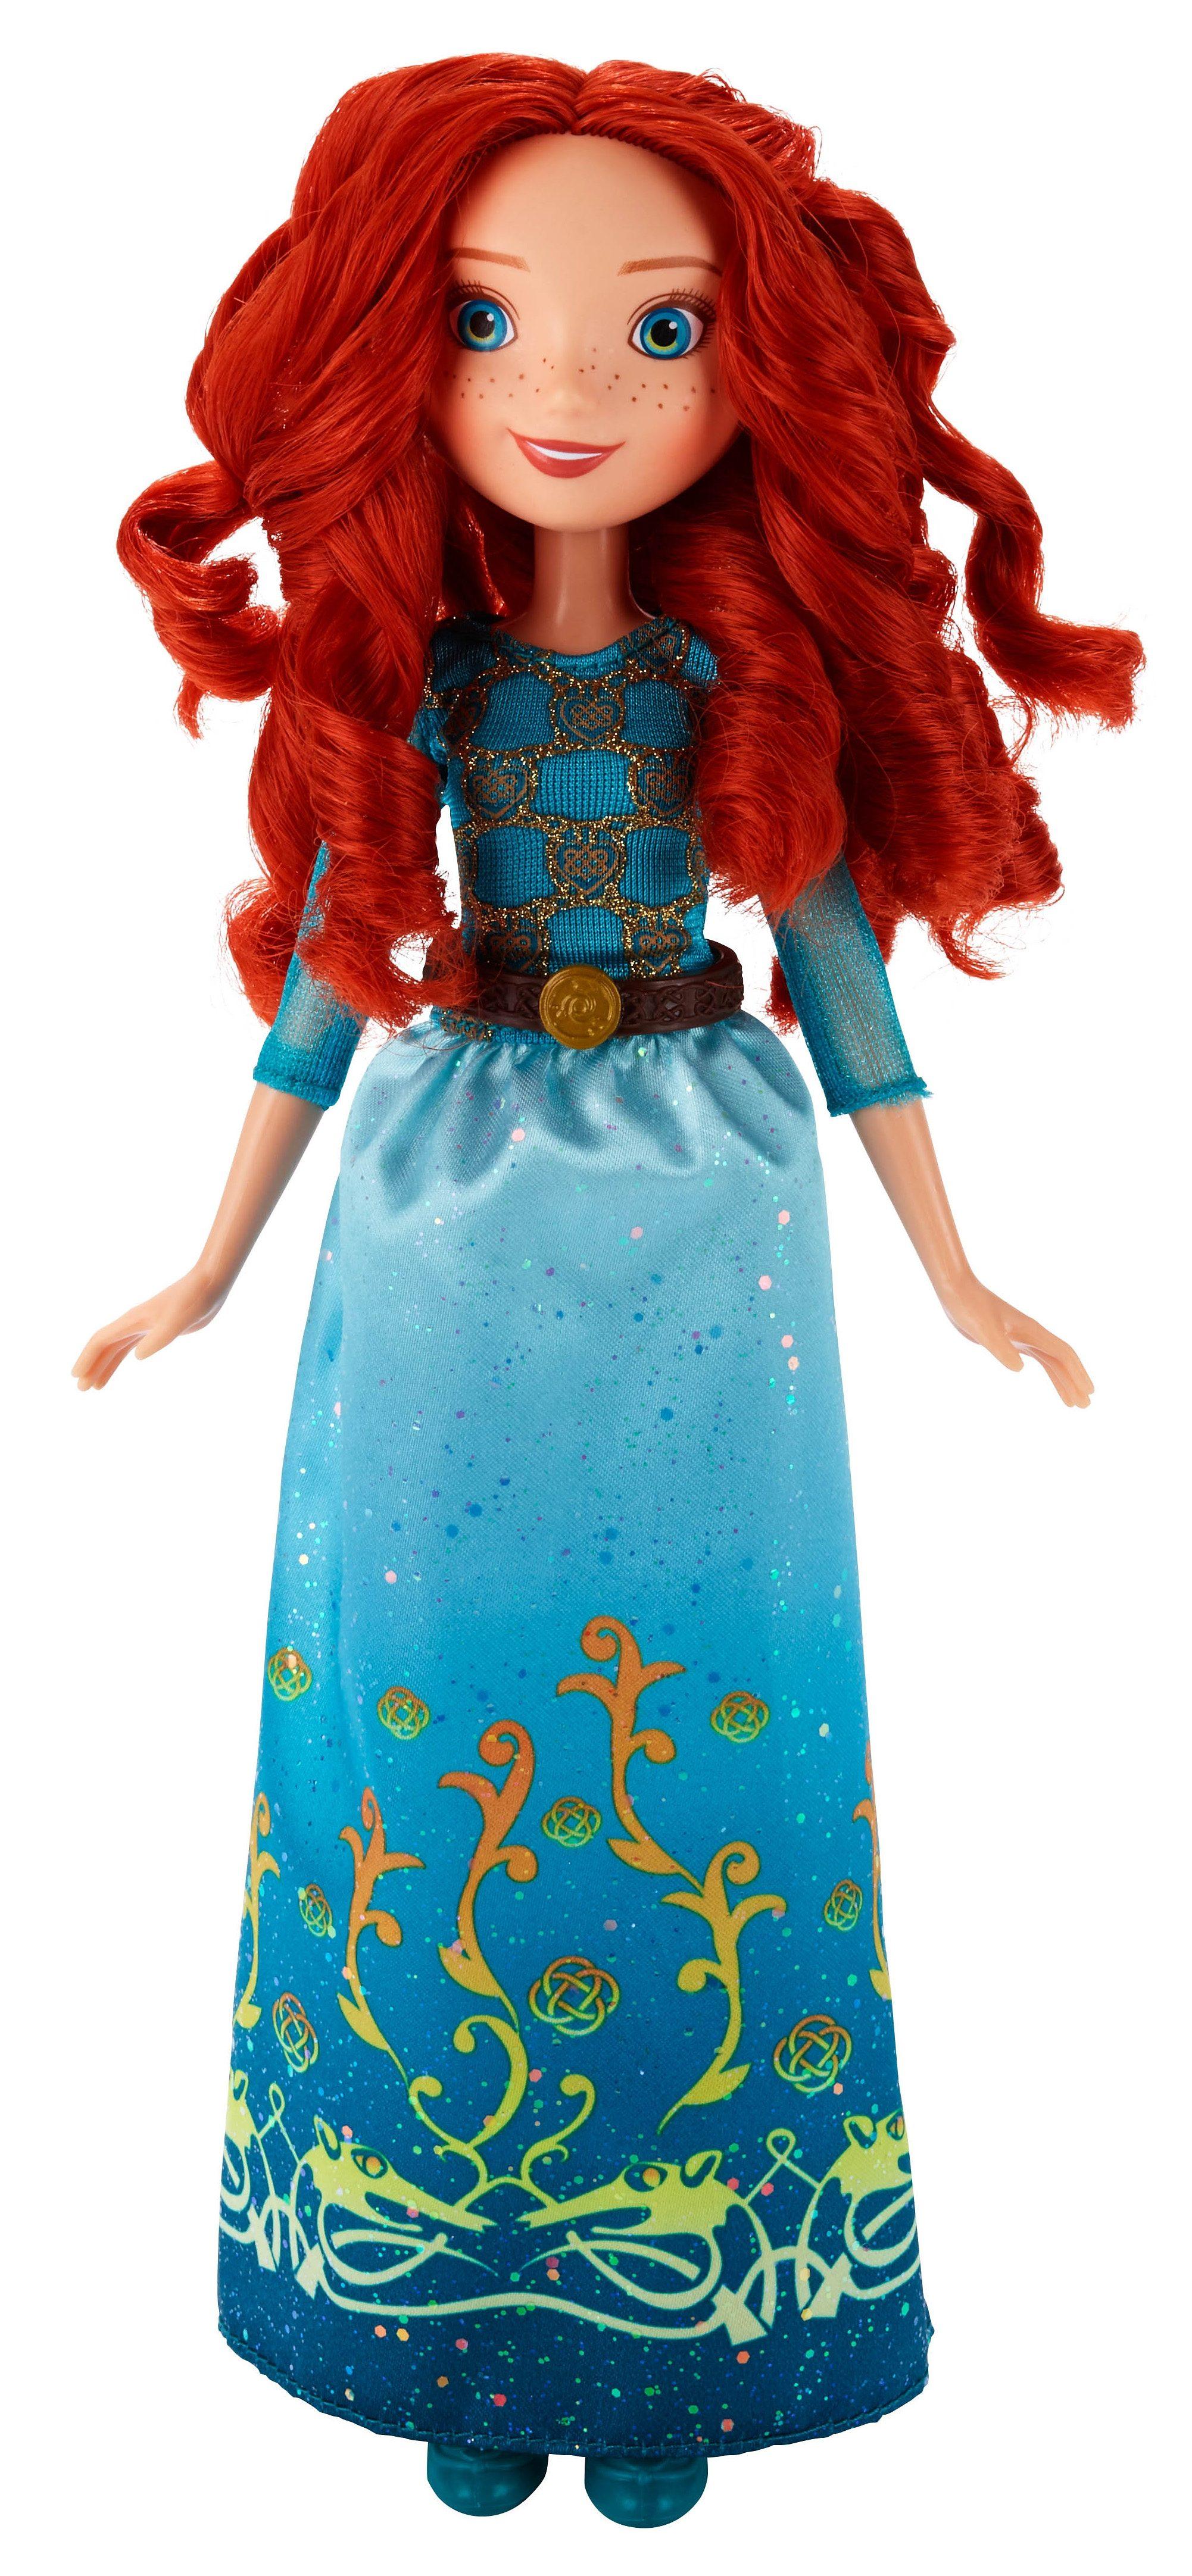 Hasbro Puppe 27 cm, »Disney Princess - Schimmerglanz Merida«